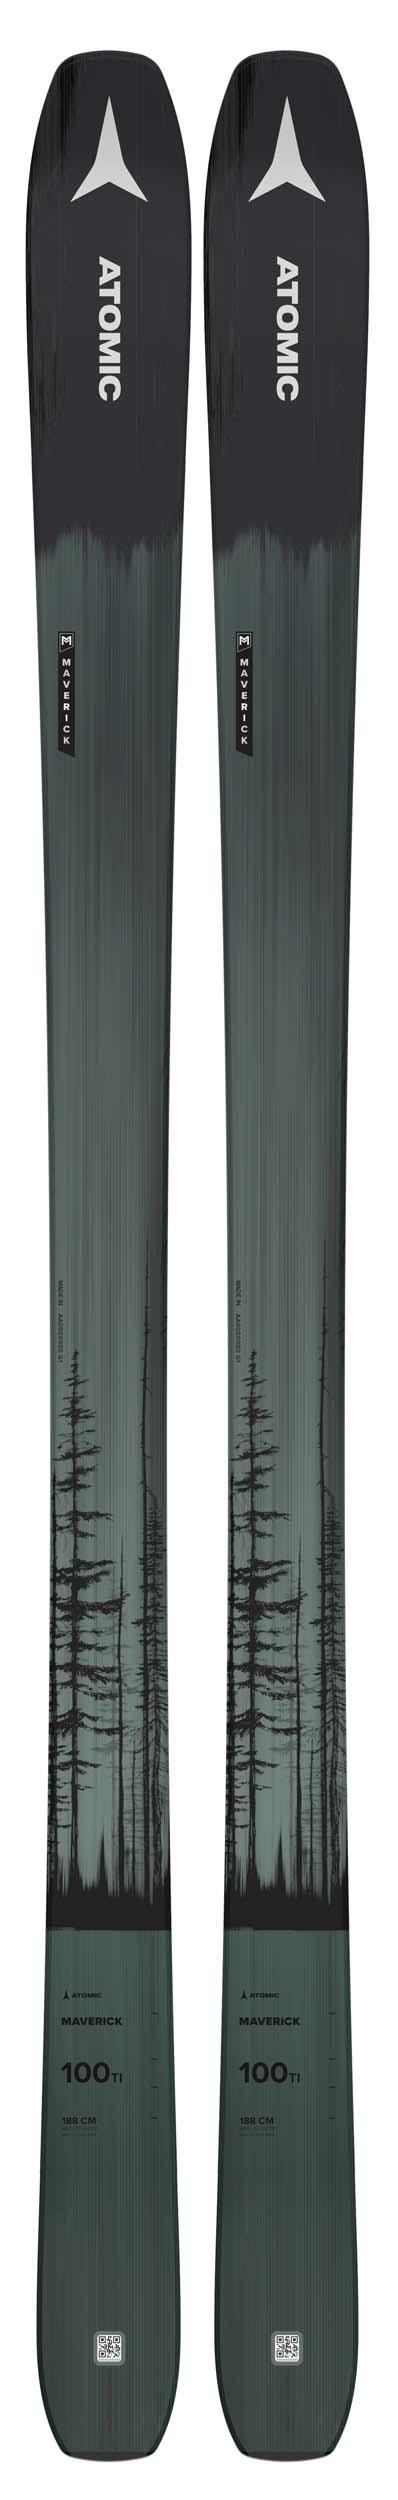 Atomic 2022 Maverick 100 TI Skis (Without Bindings / Flat) NEW !! 172,180cm